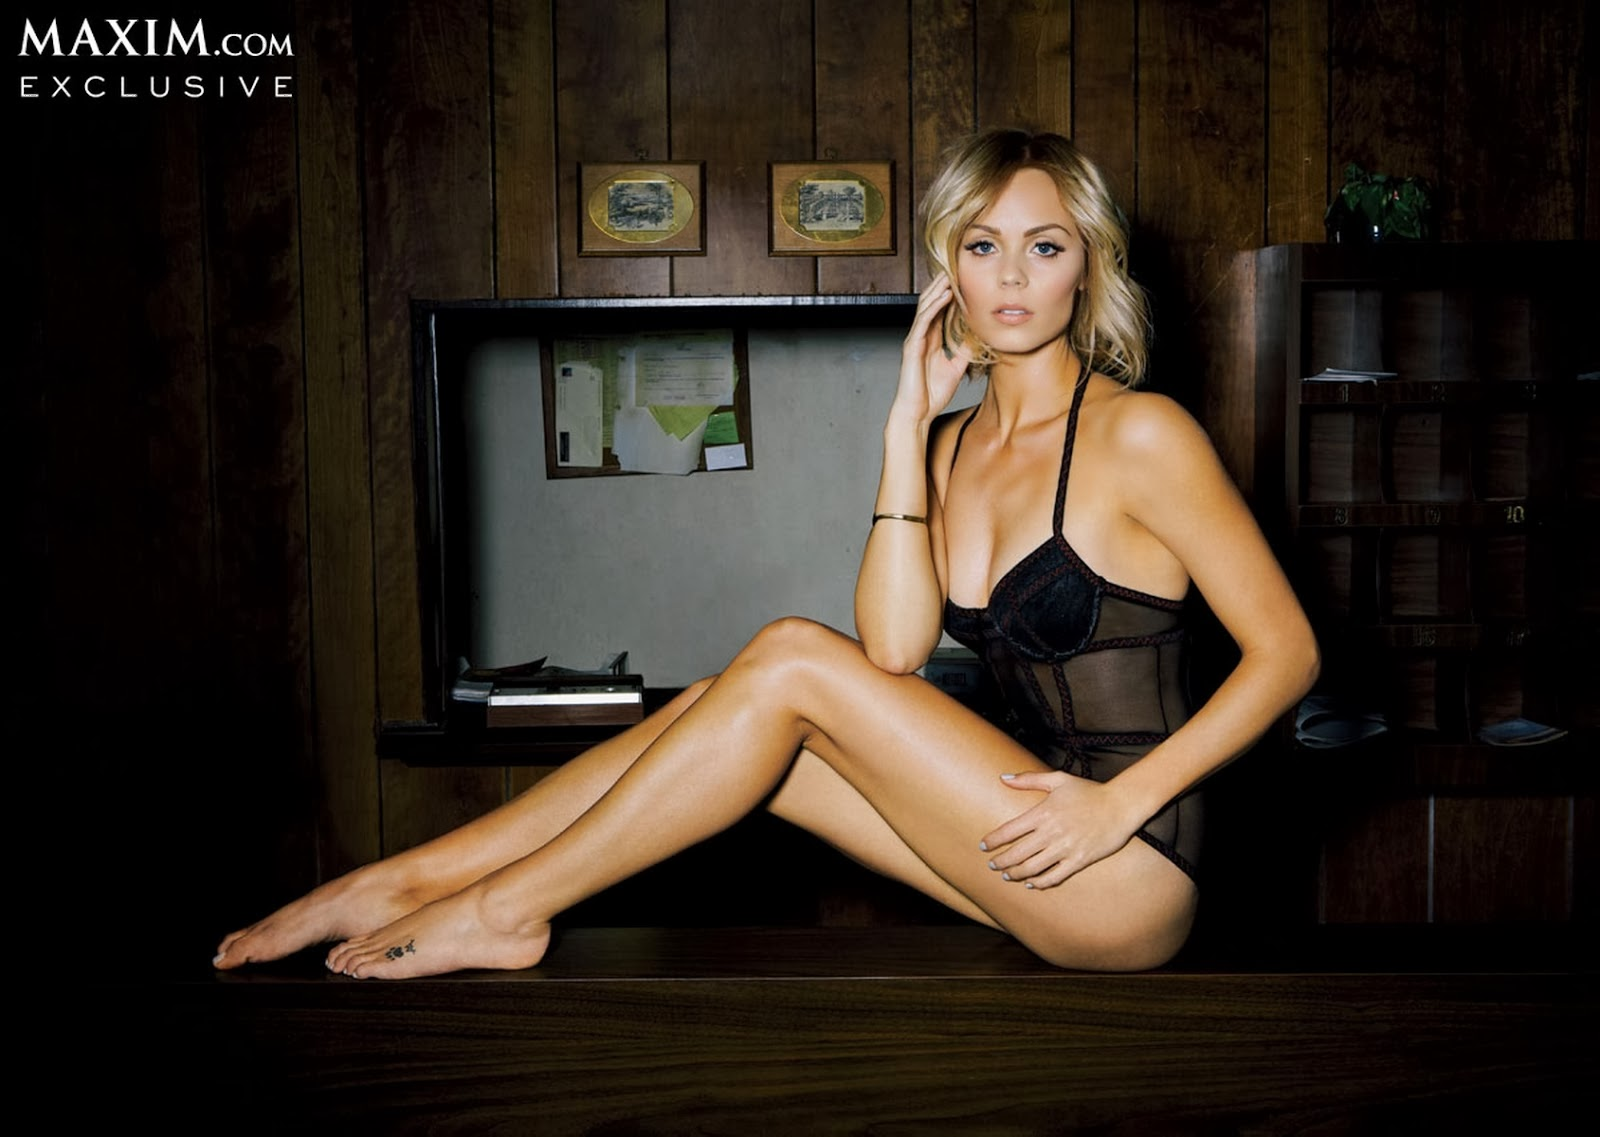 laura vandervoort in lingerie per il magazine Maxim cosce e piedi | laura vendervoort lingerie maxim magazine legs and feet